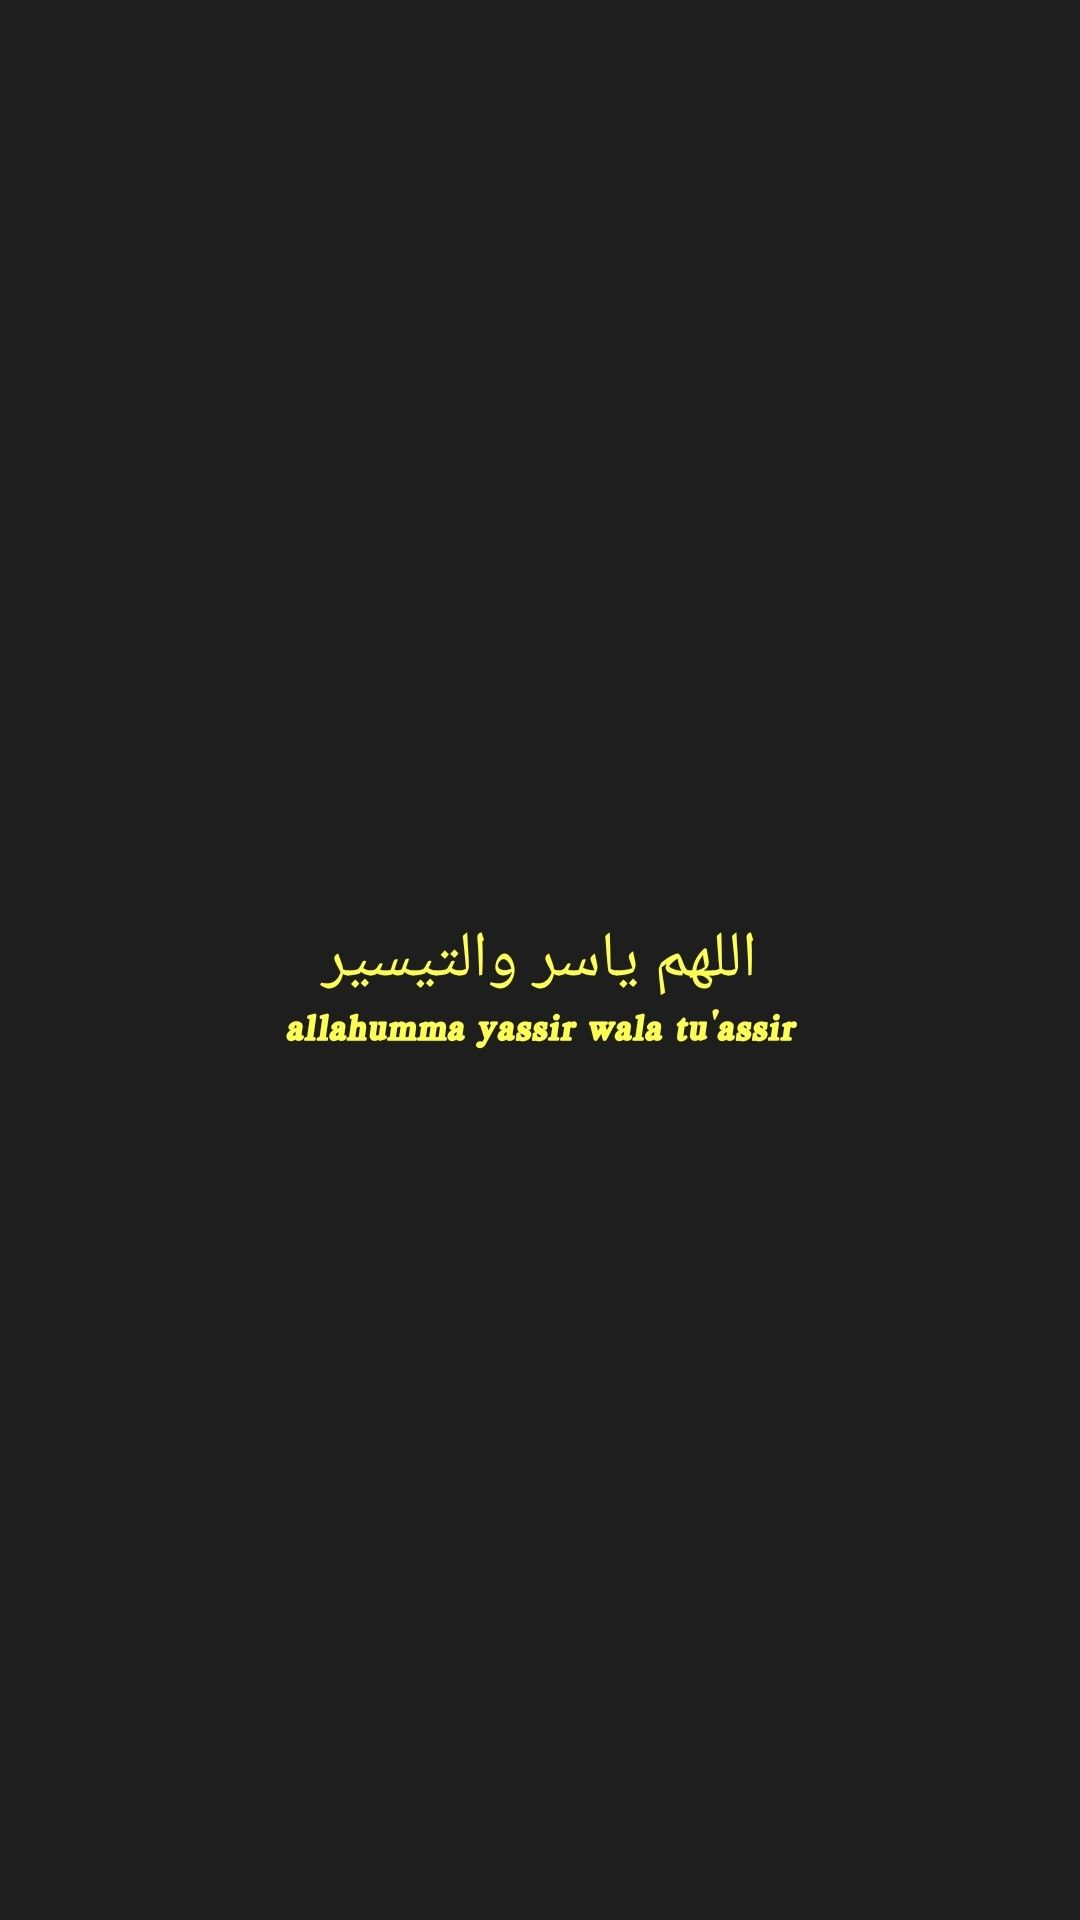 Allahumma Yassir Wala Tu Assir Kata Kata Indah Kata Kata Motivasi Motivasi